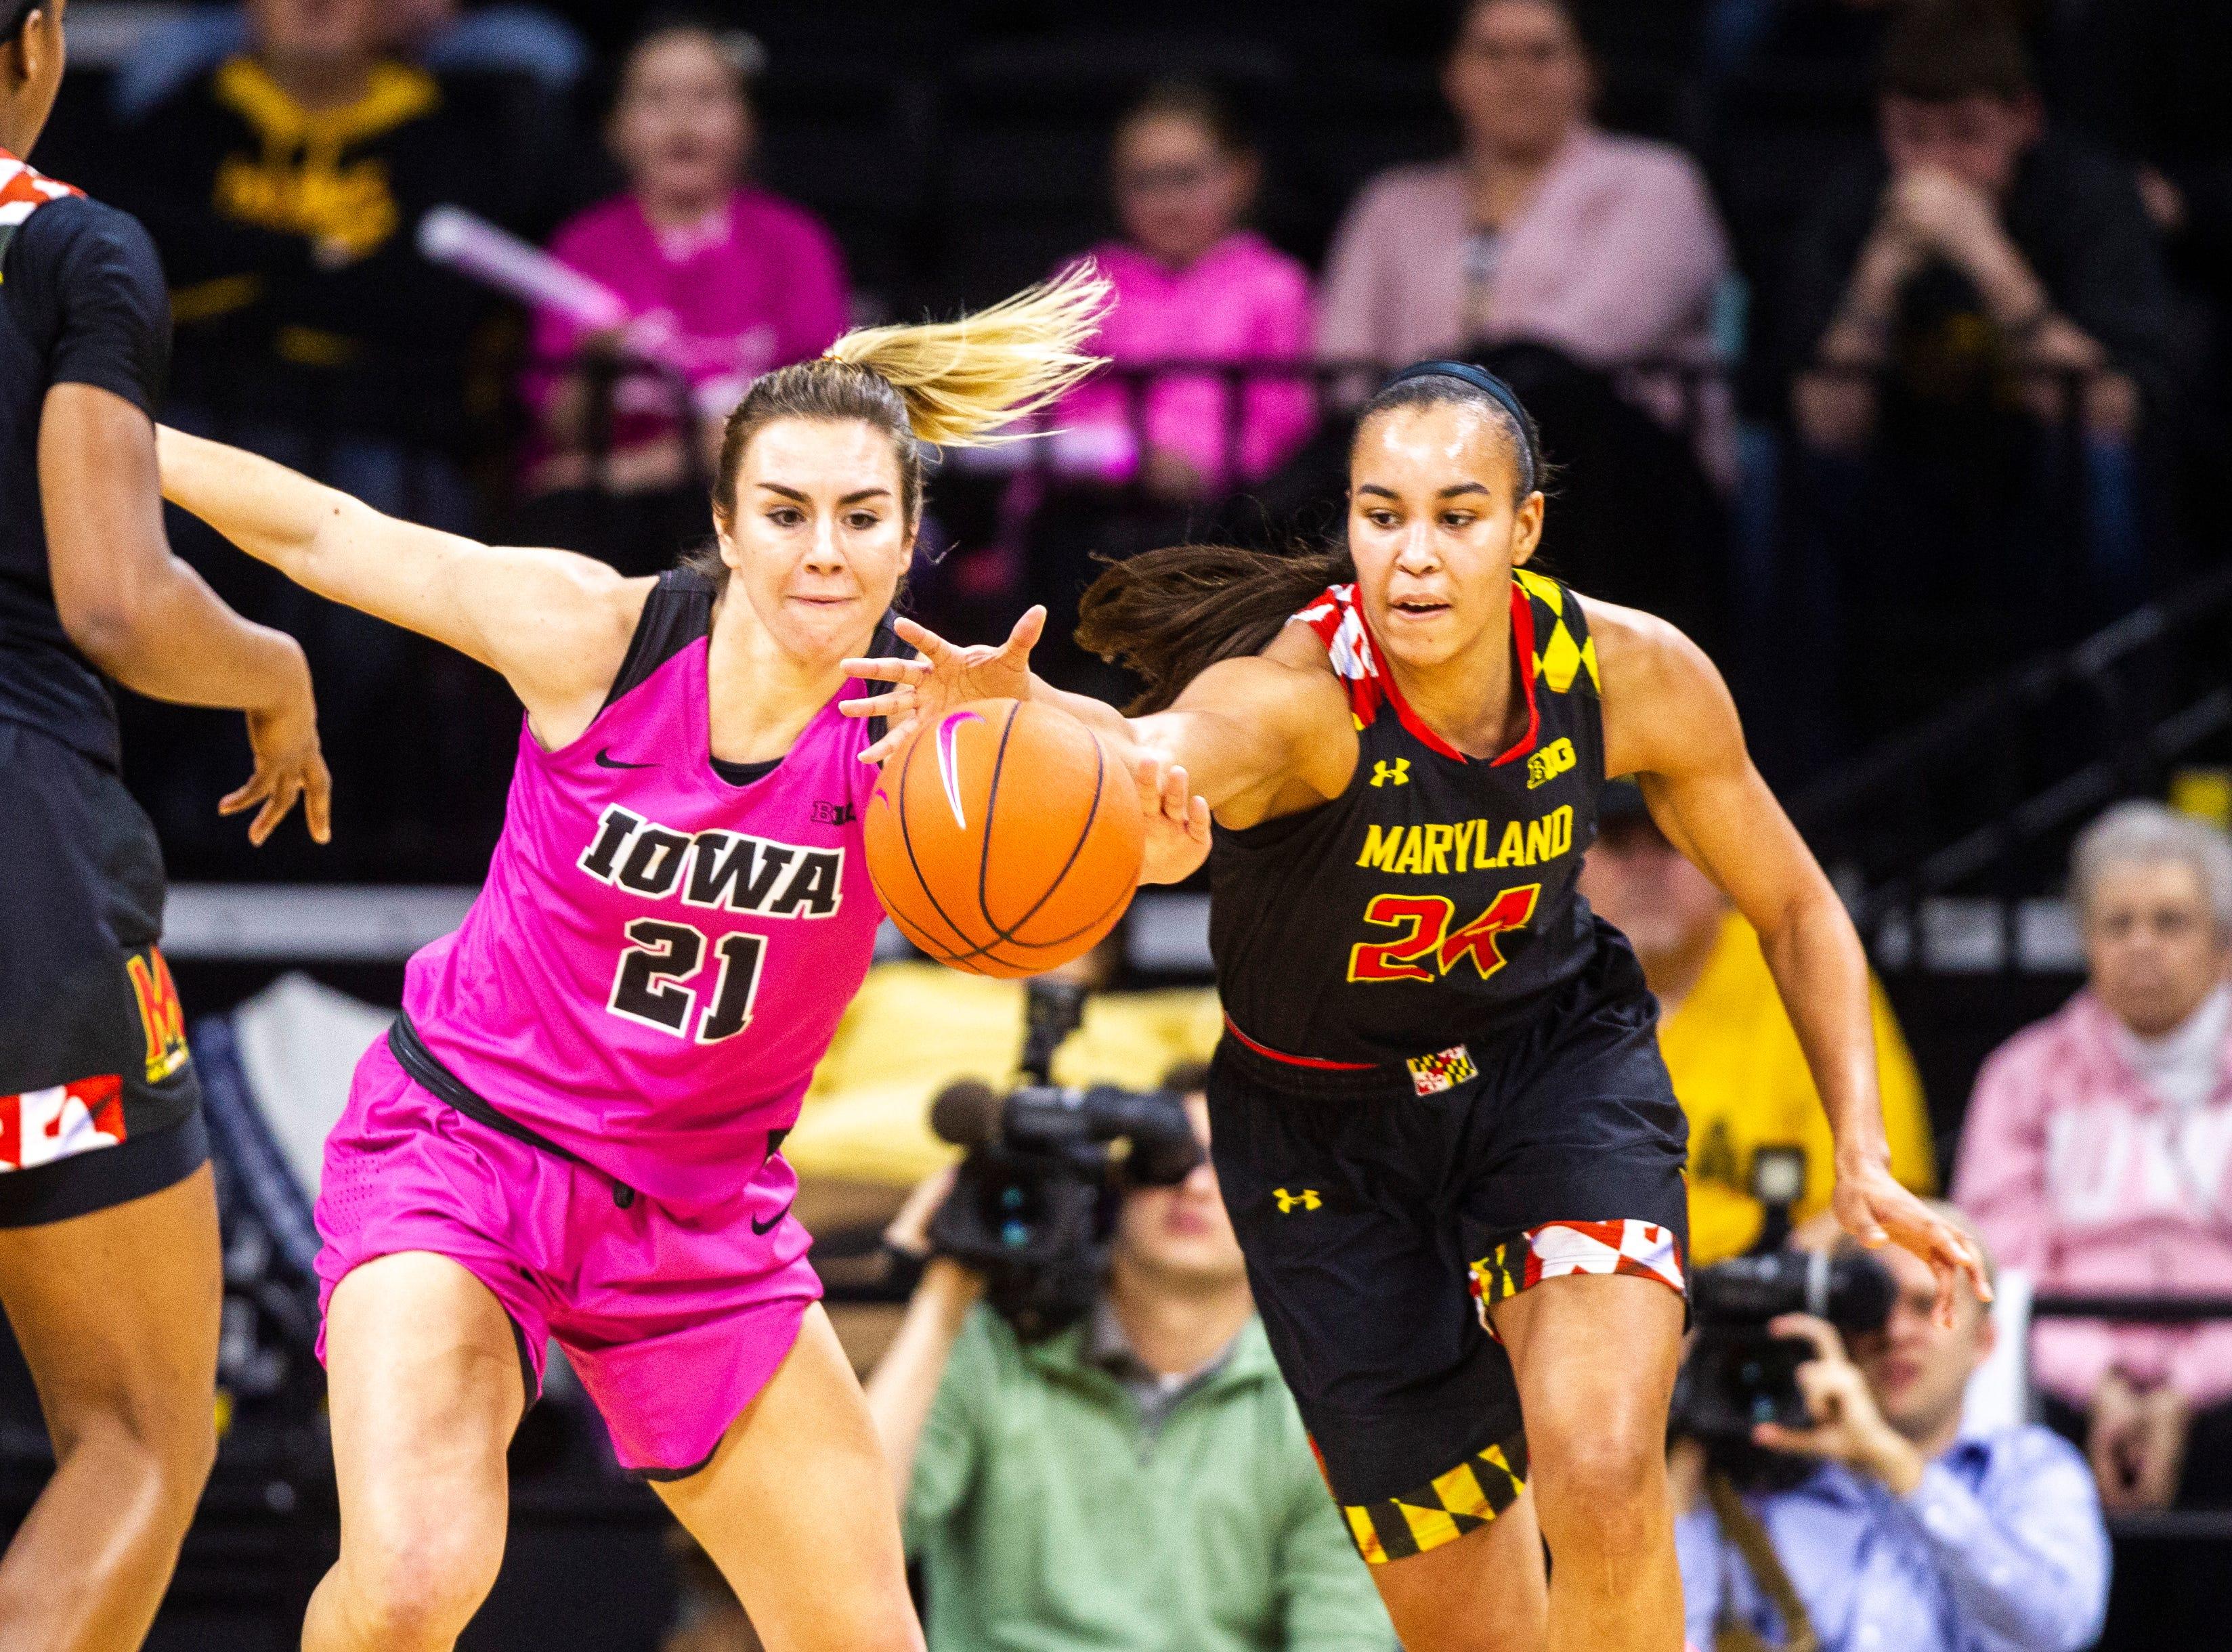 Iowa forward Hannah Stewart (21) battles Maryland forward Stephanie Jones (24) for a loose ball during a NCAA Big Ten Conference women's basketball game on Sunday, Feb. 17, 2019 at Carver-Hawkeye Arena in Iowa City, Iowa.